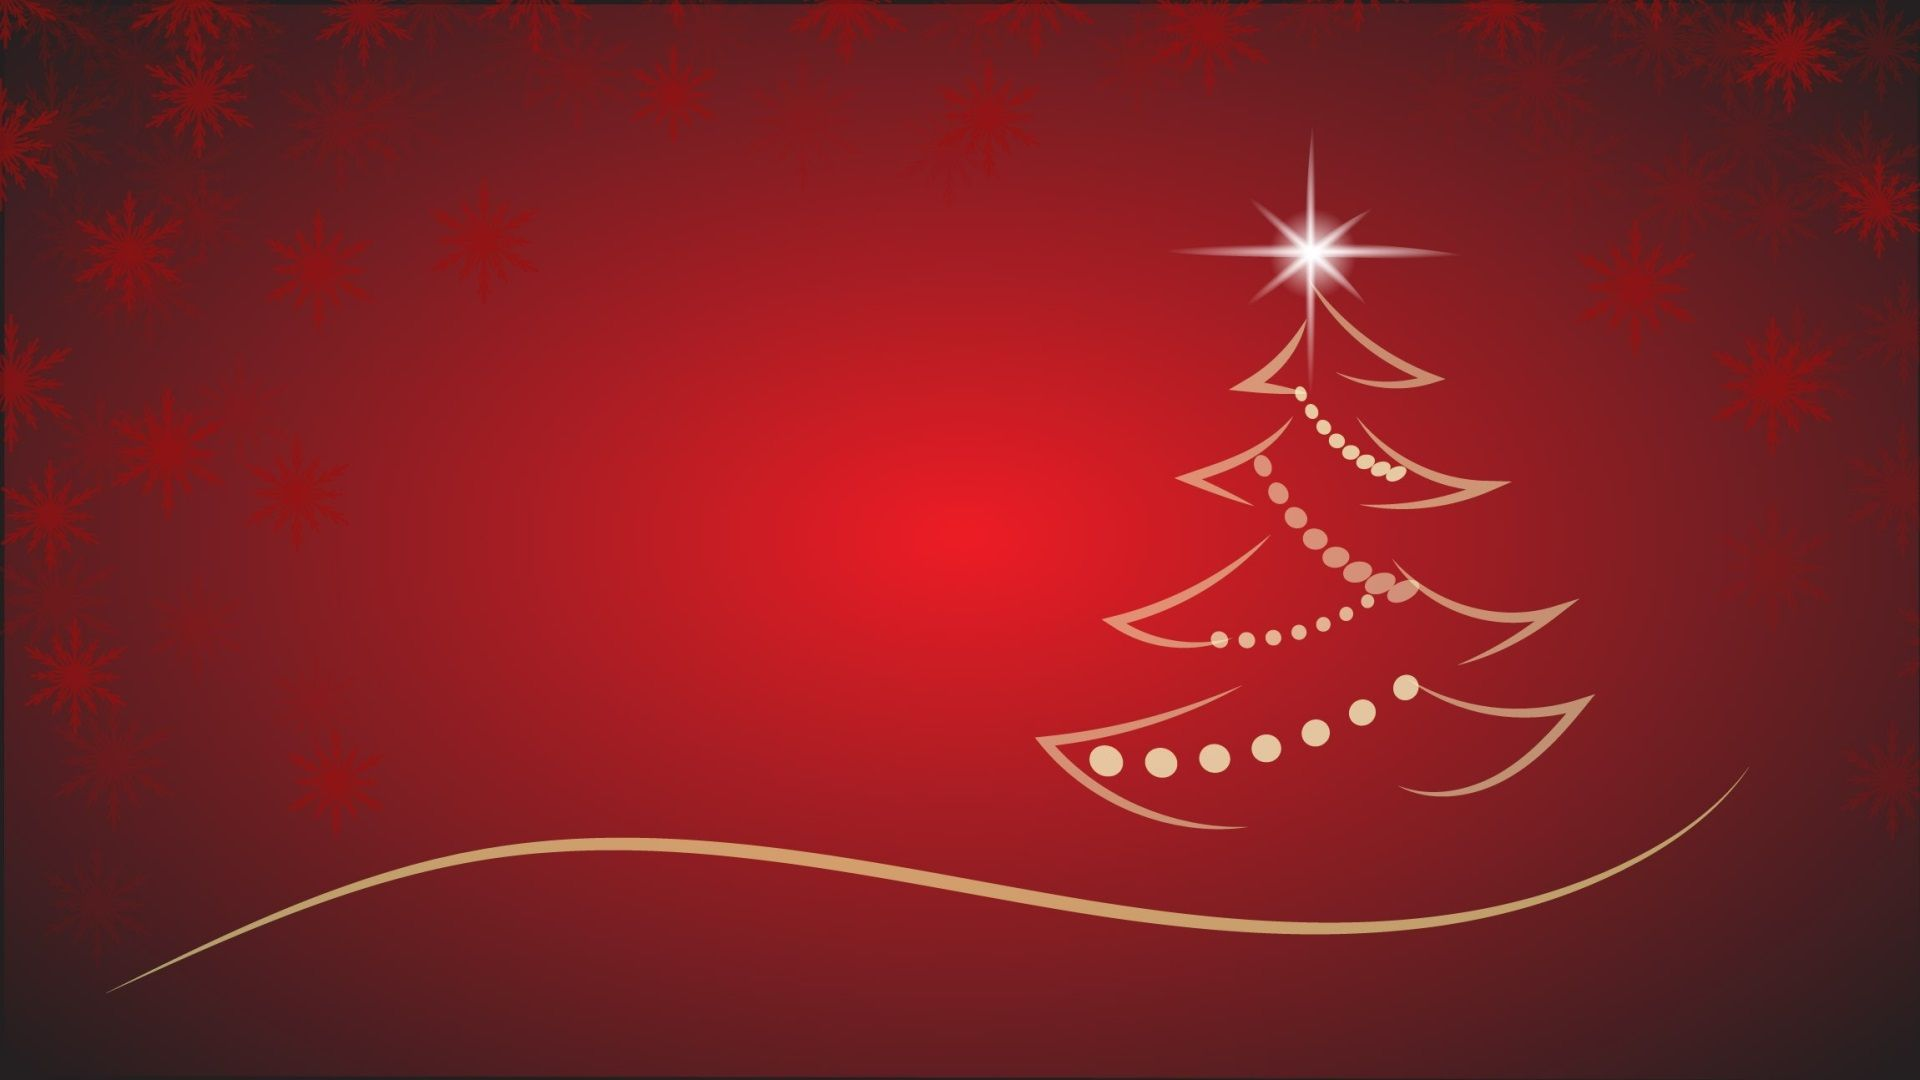 1920x1080 Christmas Best Widescreen Wallpapers Christmas Images Christmas Image Download Christmas Wallpaper